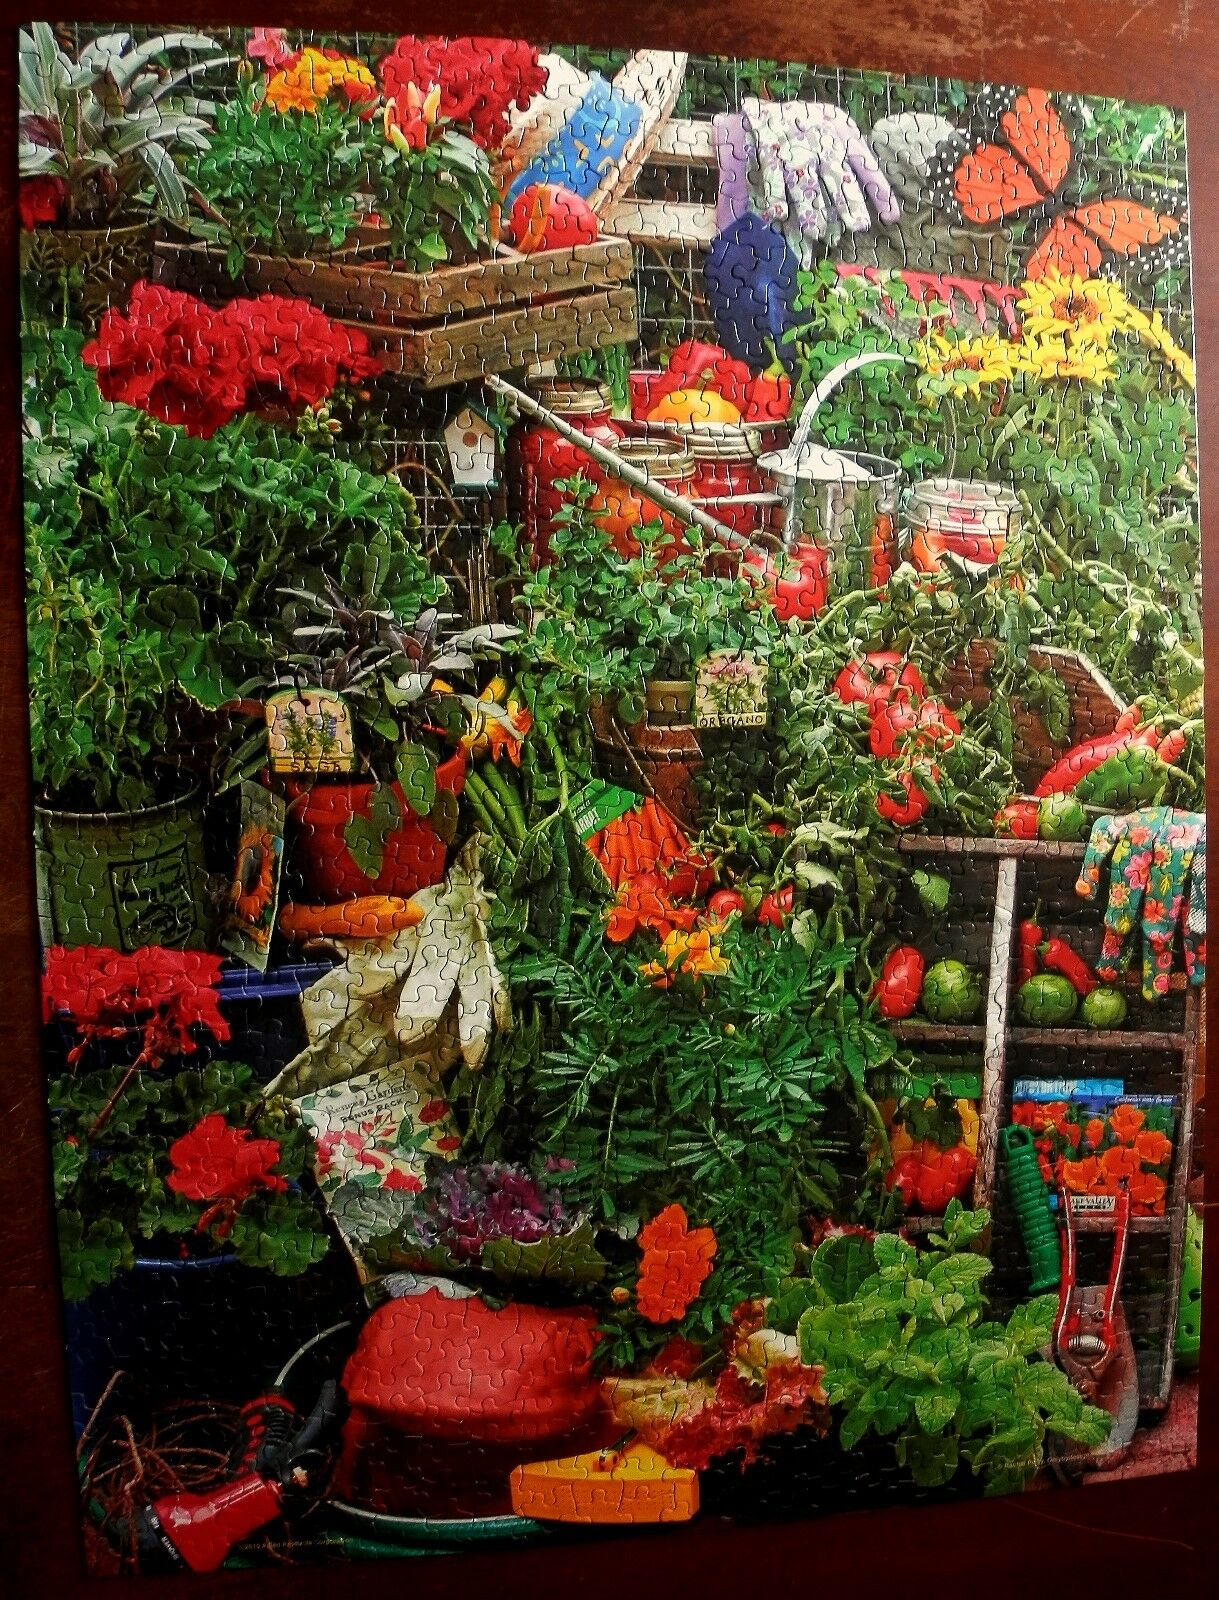 2006 springbock puzzle garten freuden - gemse Blaumen samen cib